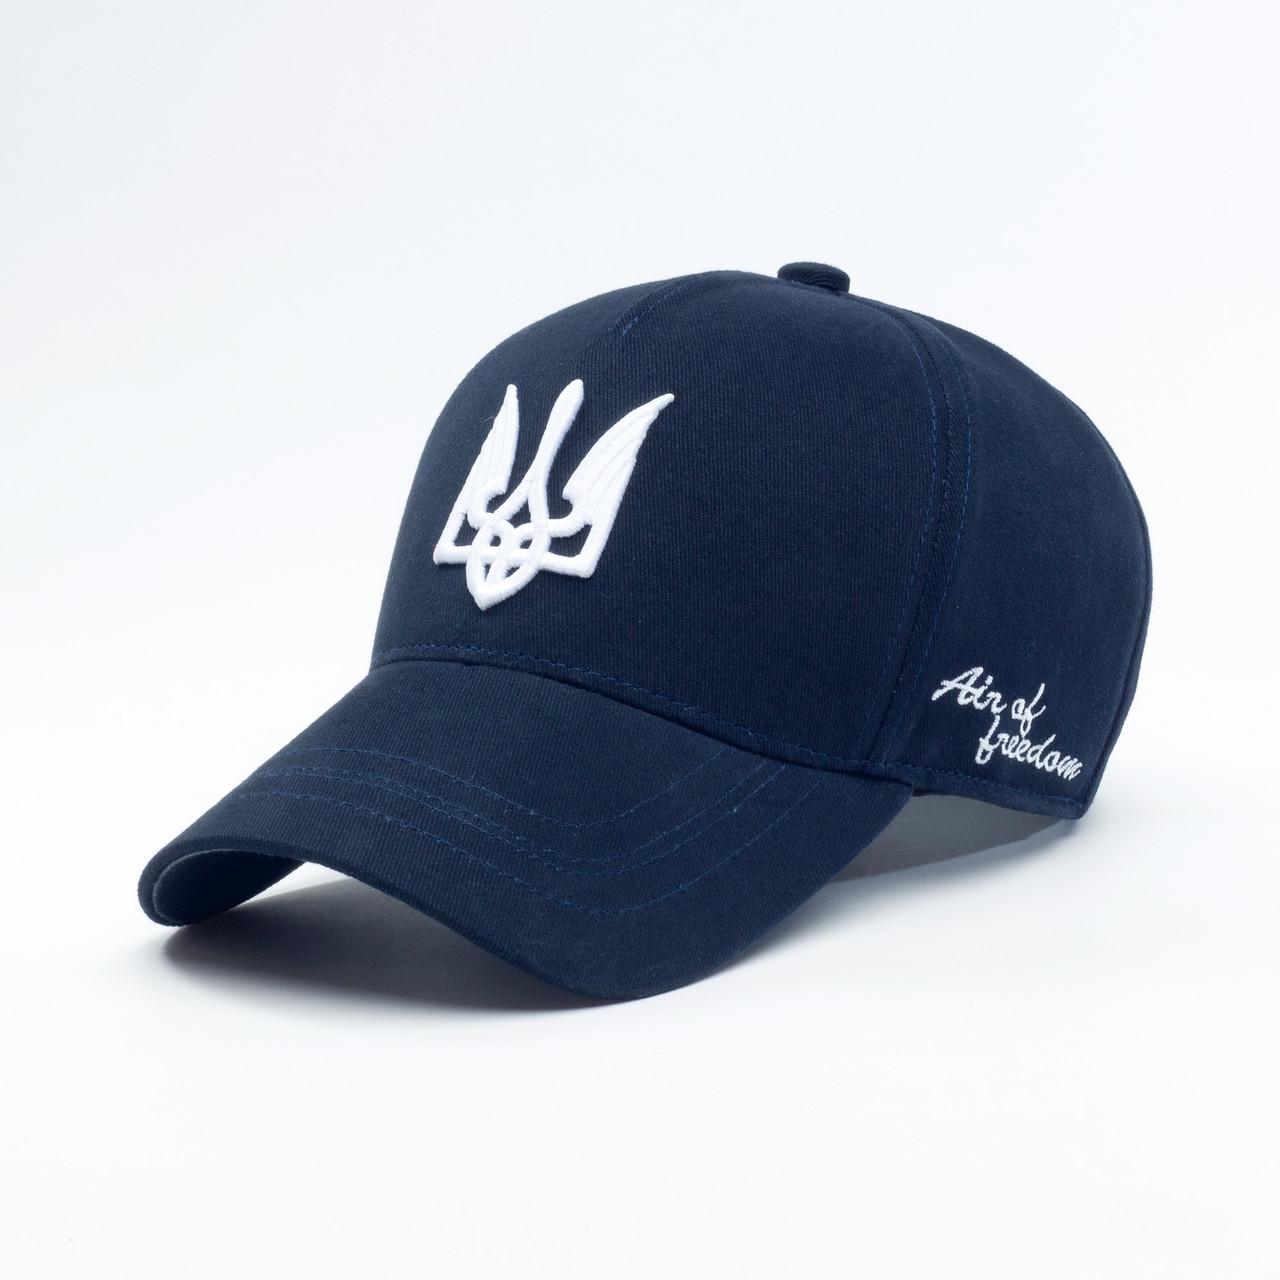 Купить Кепка бейсболка мужская INAL air of freedom XL / 59-60 RU Синий 36859